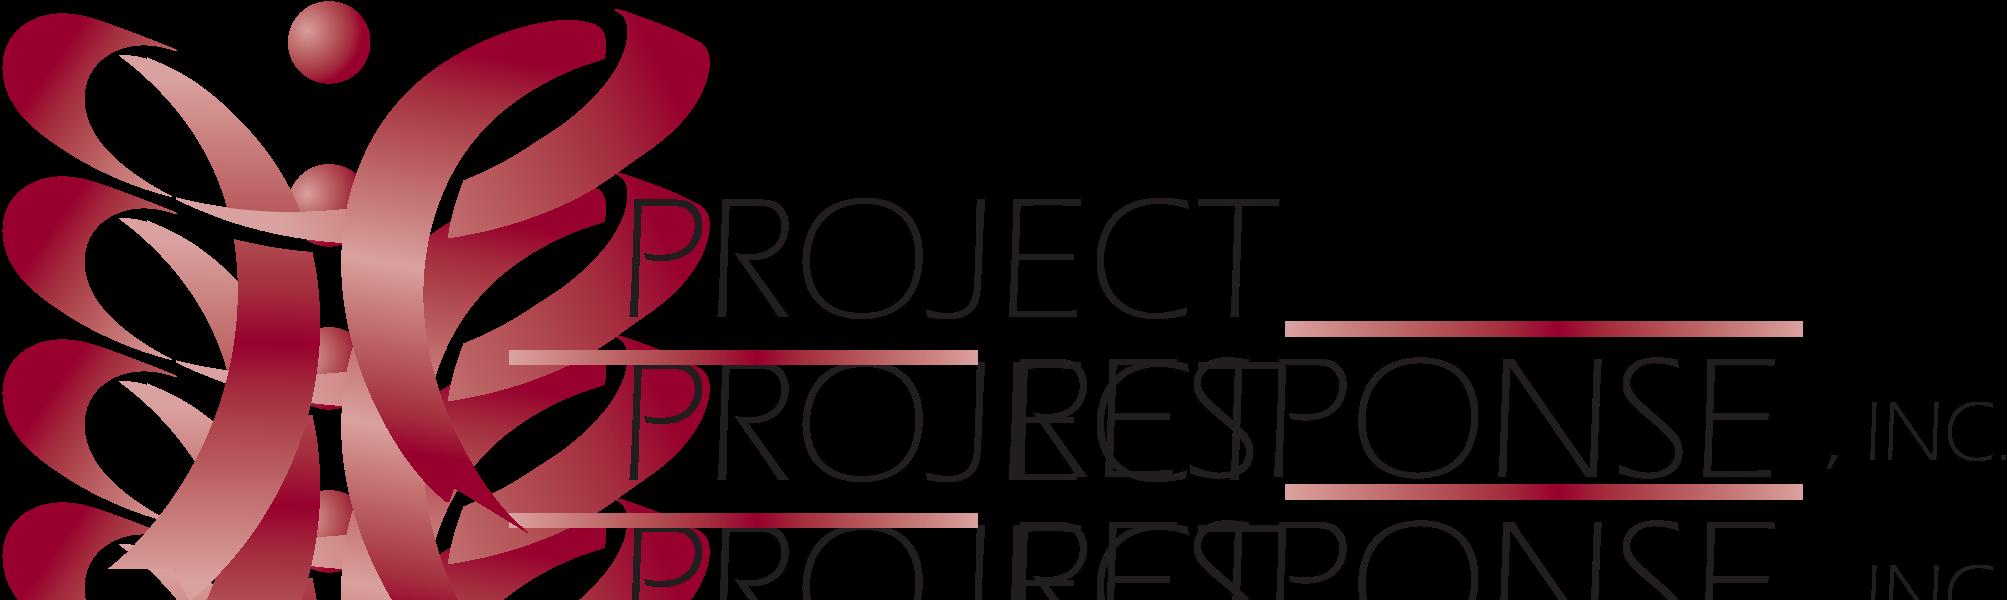 Project Response, Inc